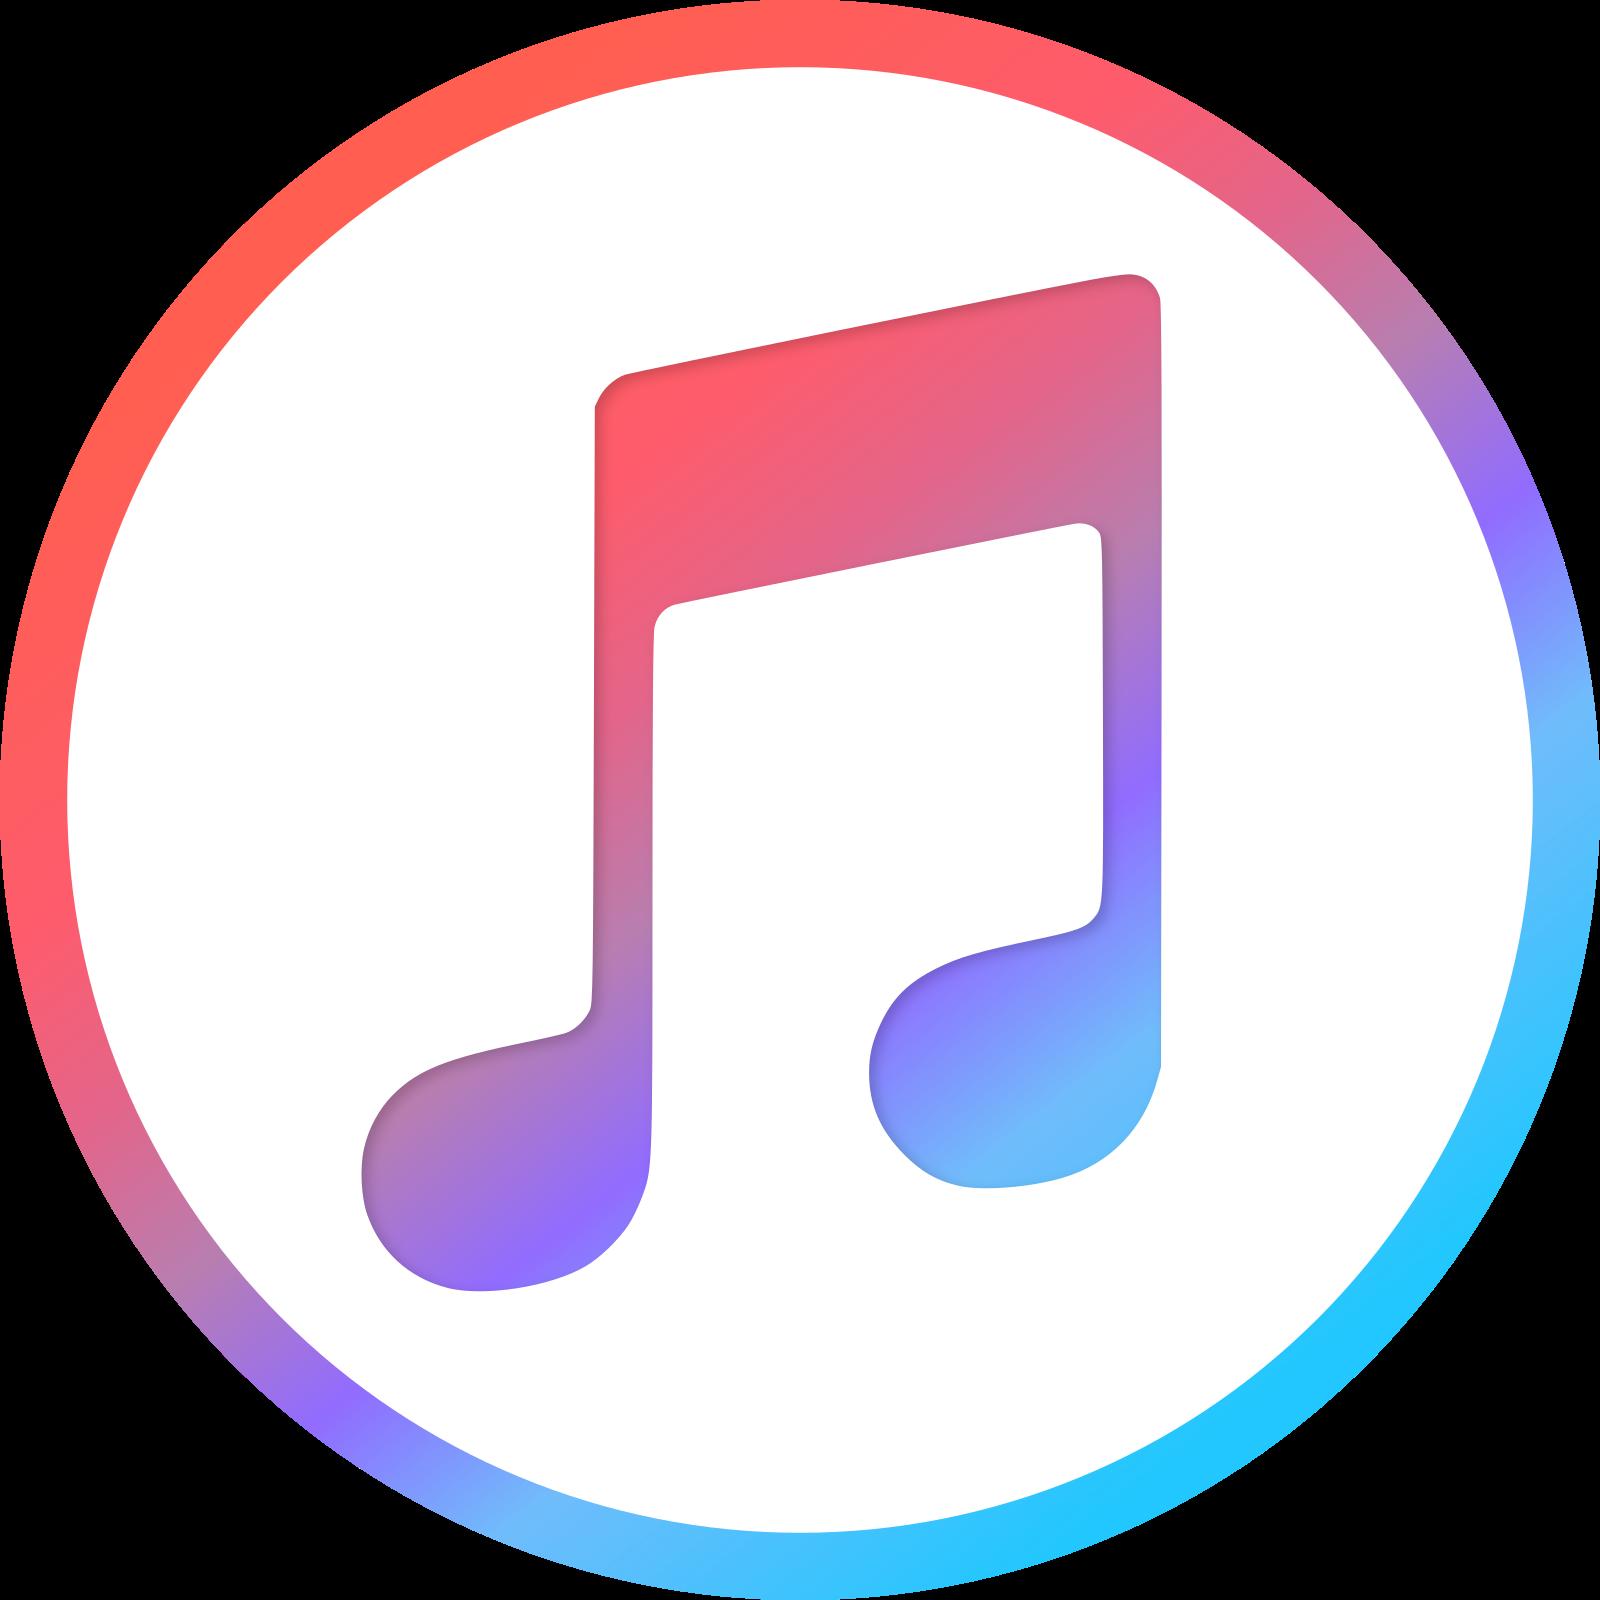 itunes logo 5 - iTunes Logo